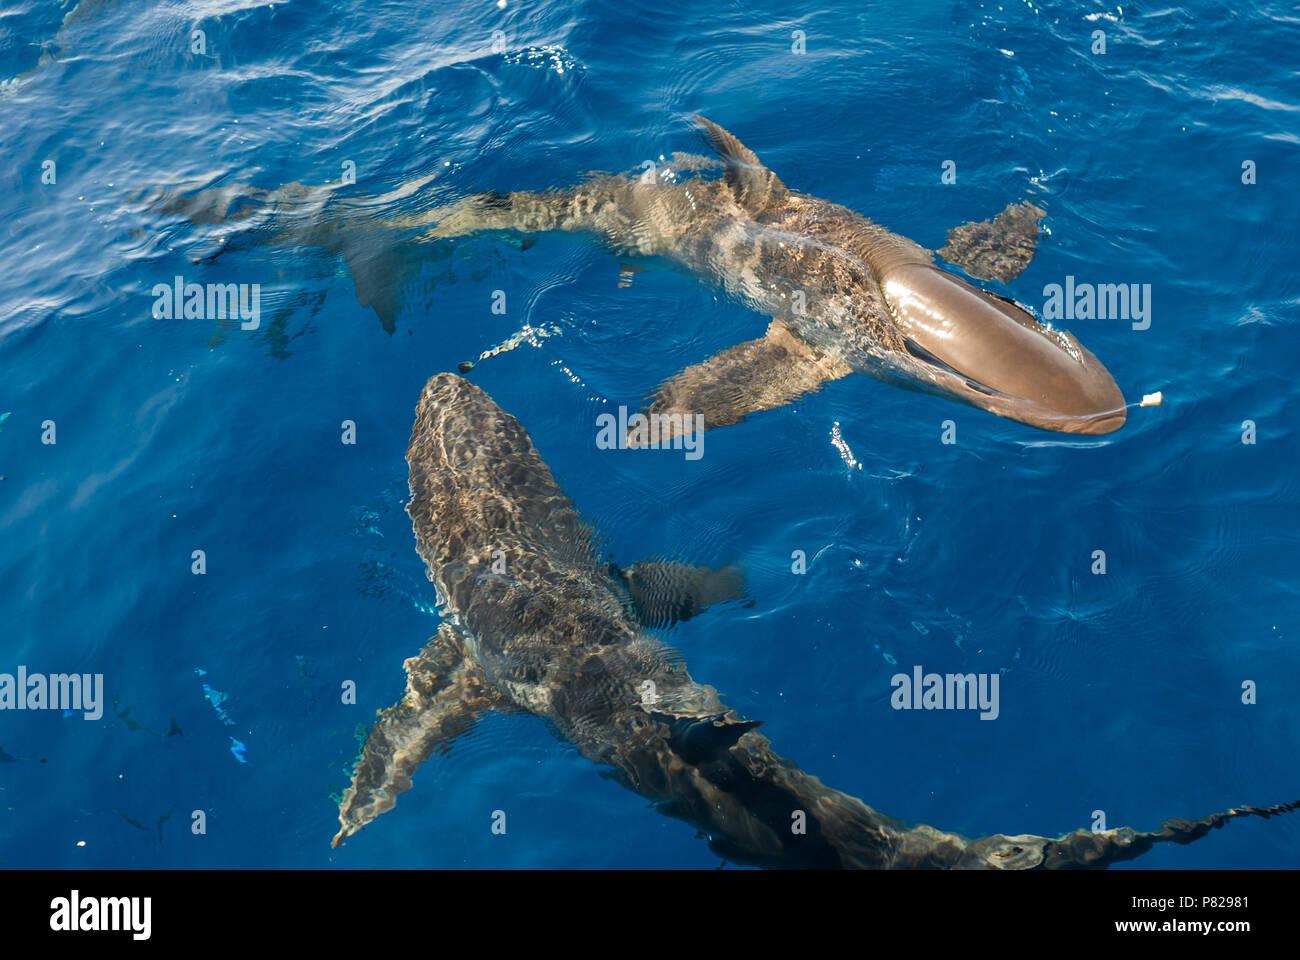 requiem shark, Carcharhinus falciformis, on the surface, Red Sea, Egypt - Stock Image